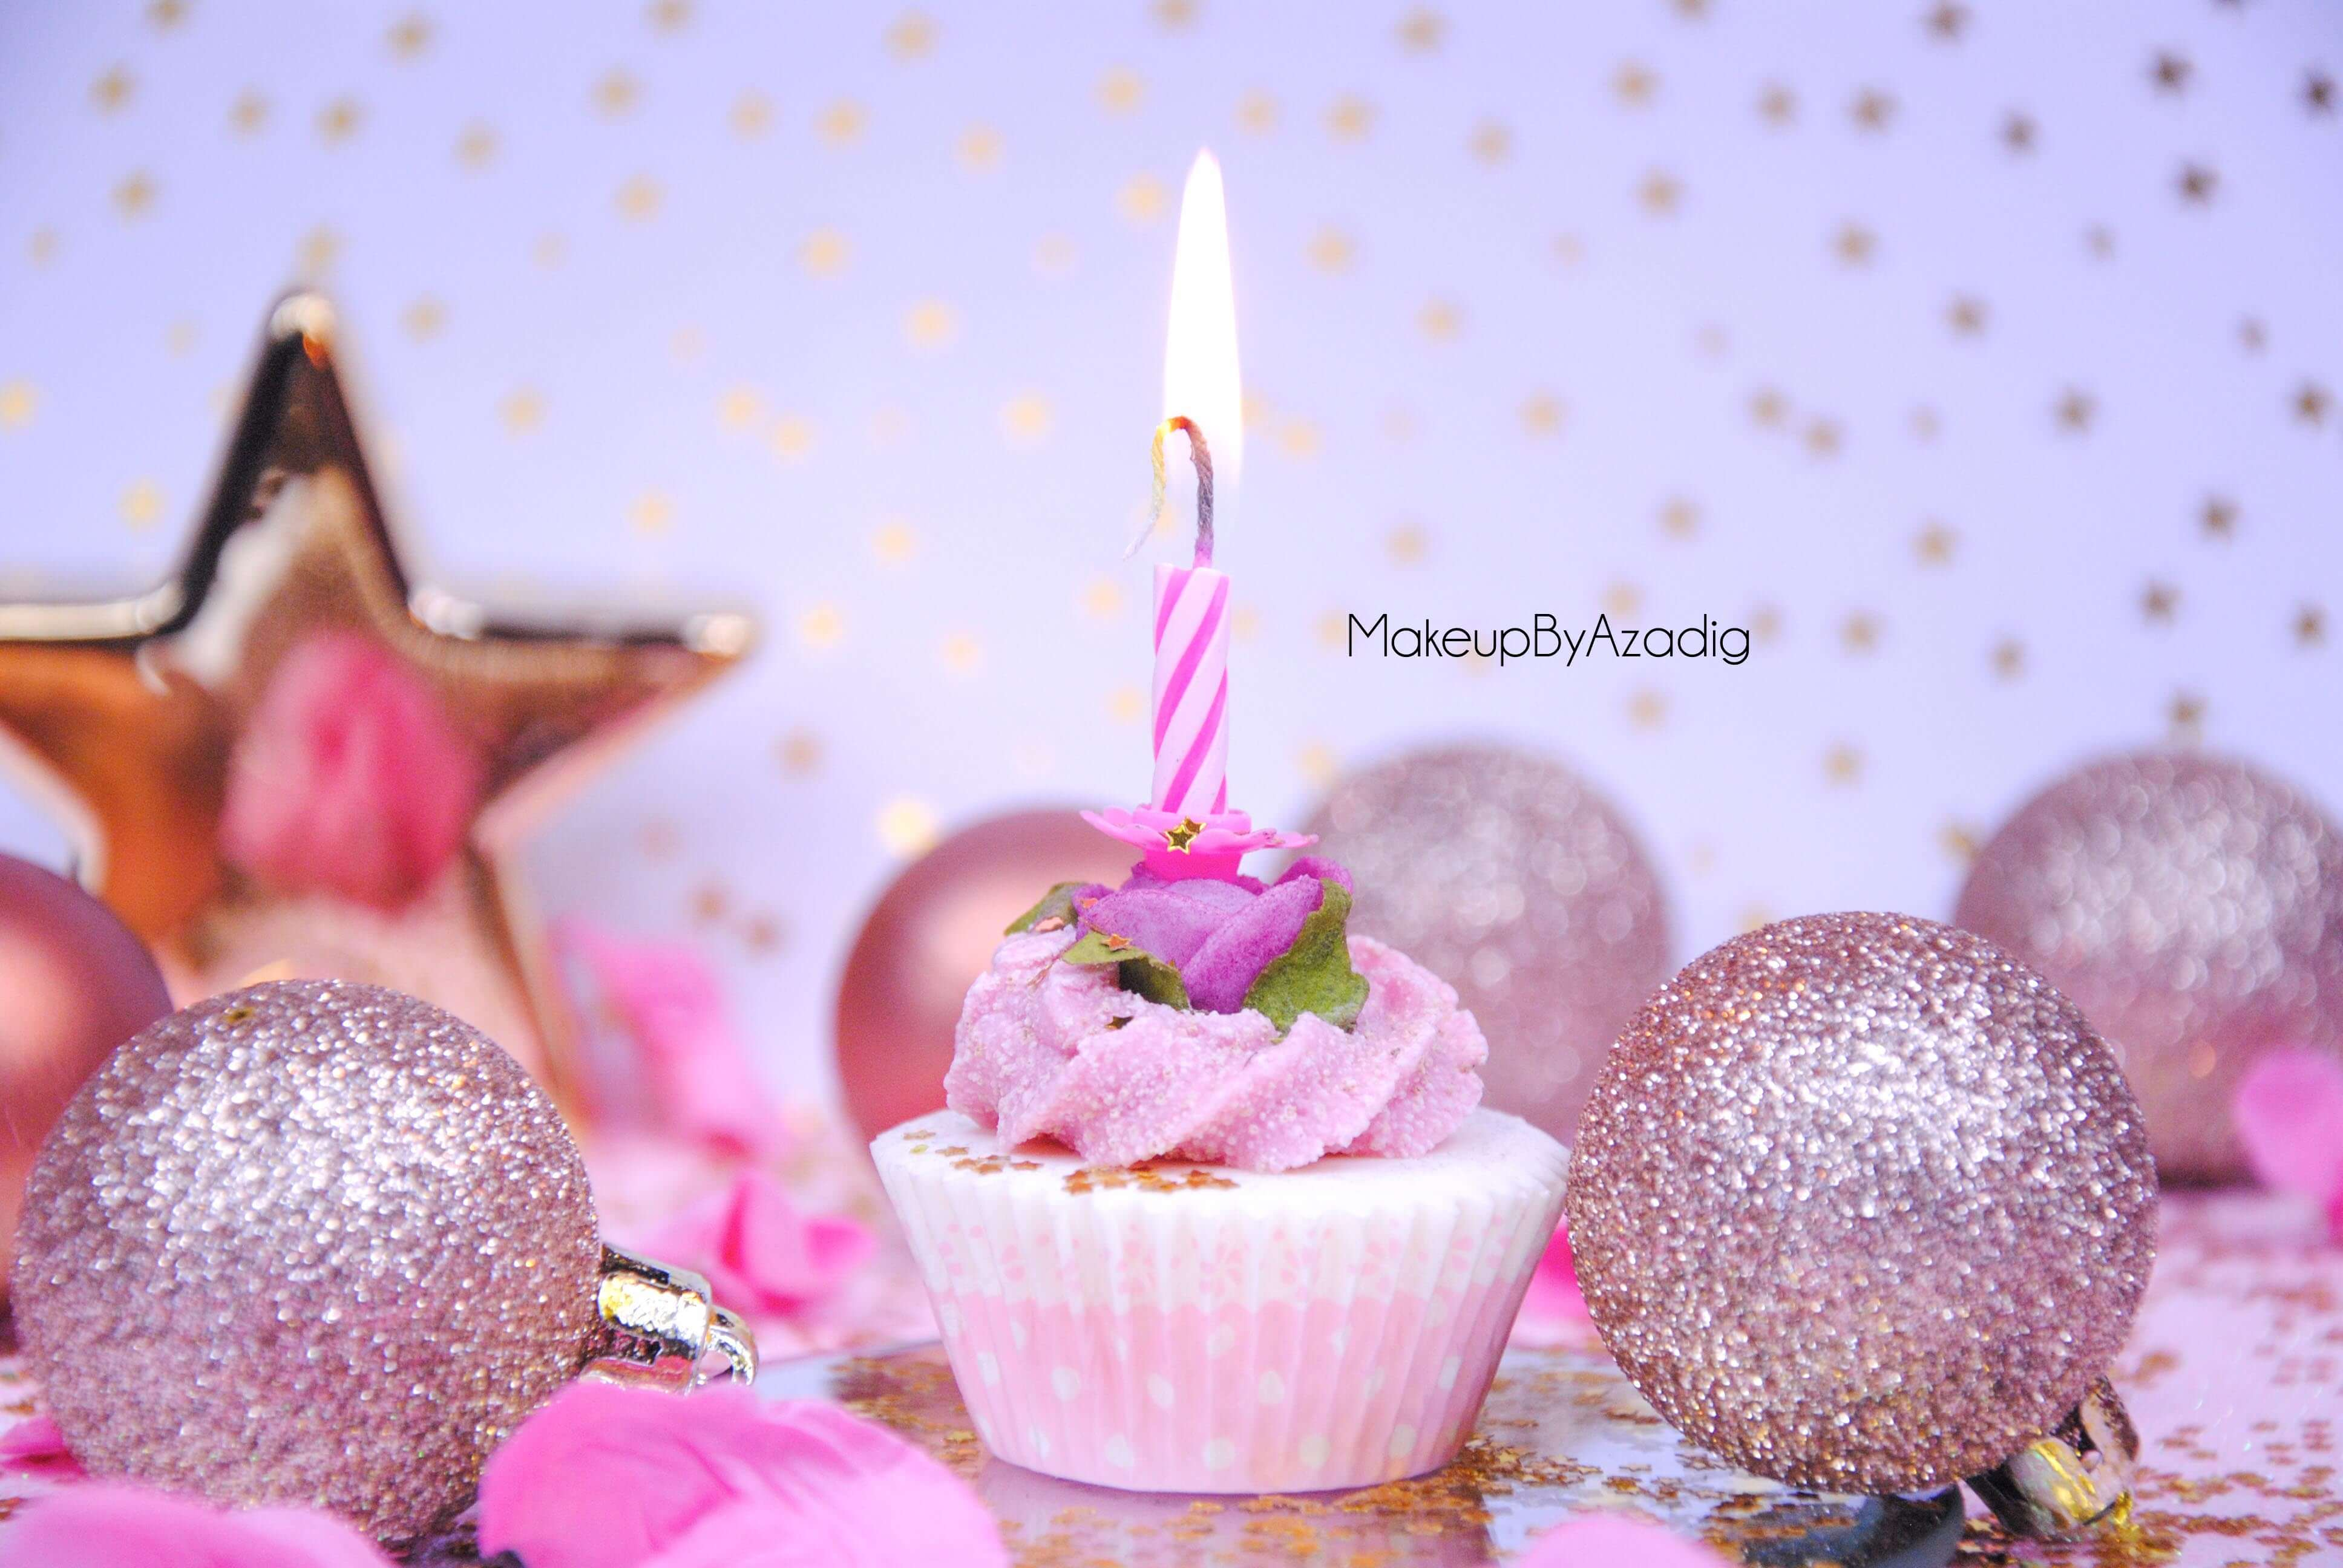 rose-makeupbyazadig-joyeux-blog-anniversaire-influencer-troyes-paris-love